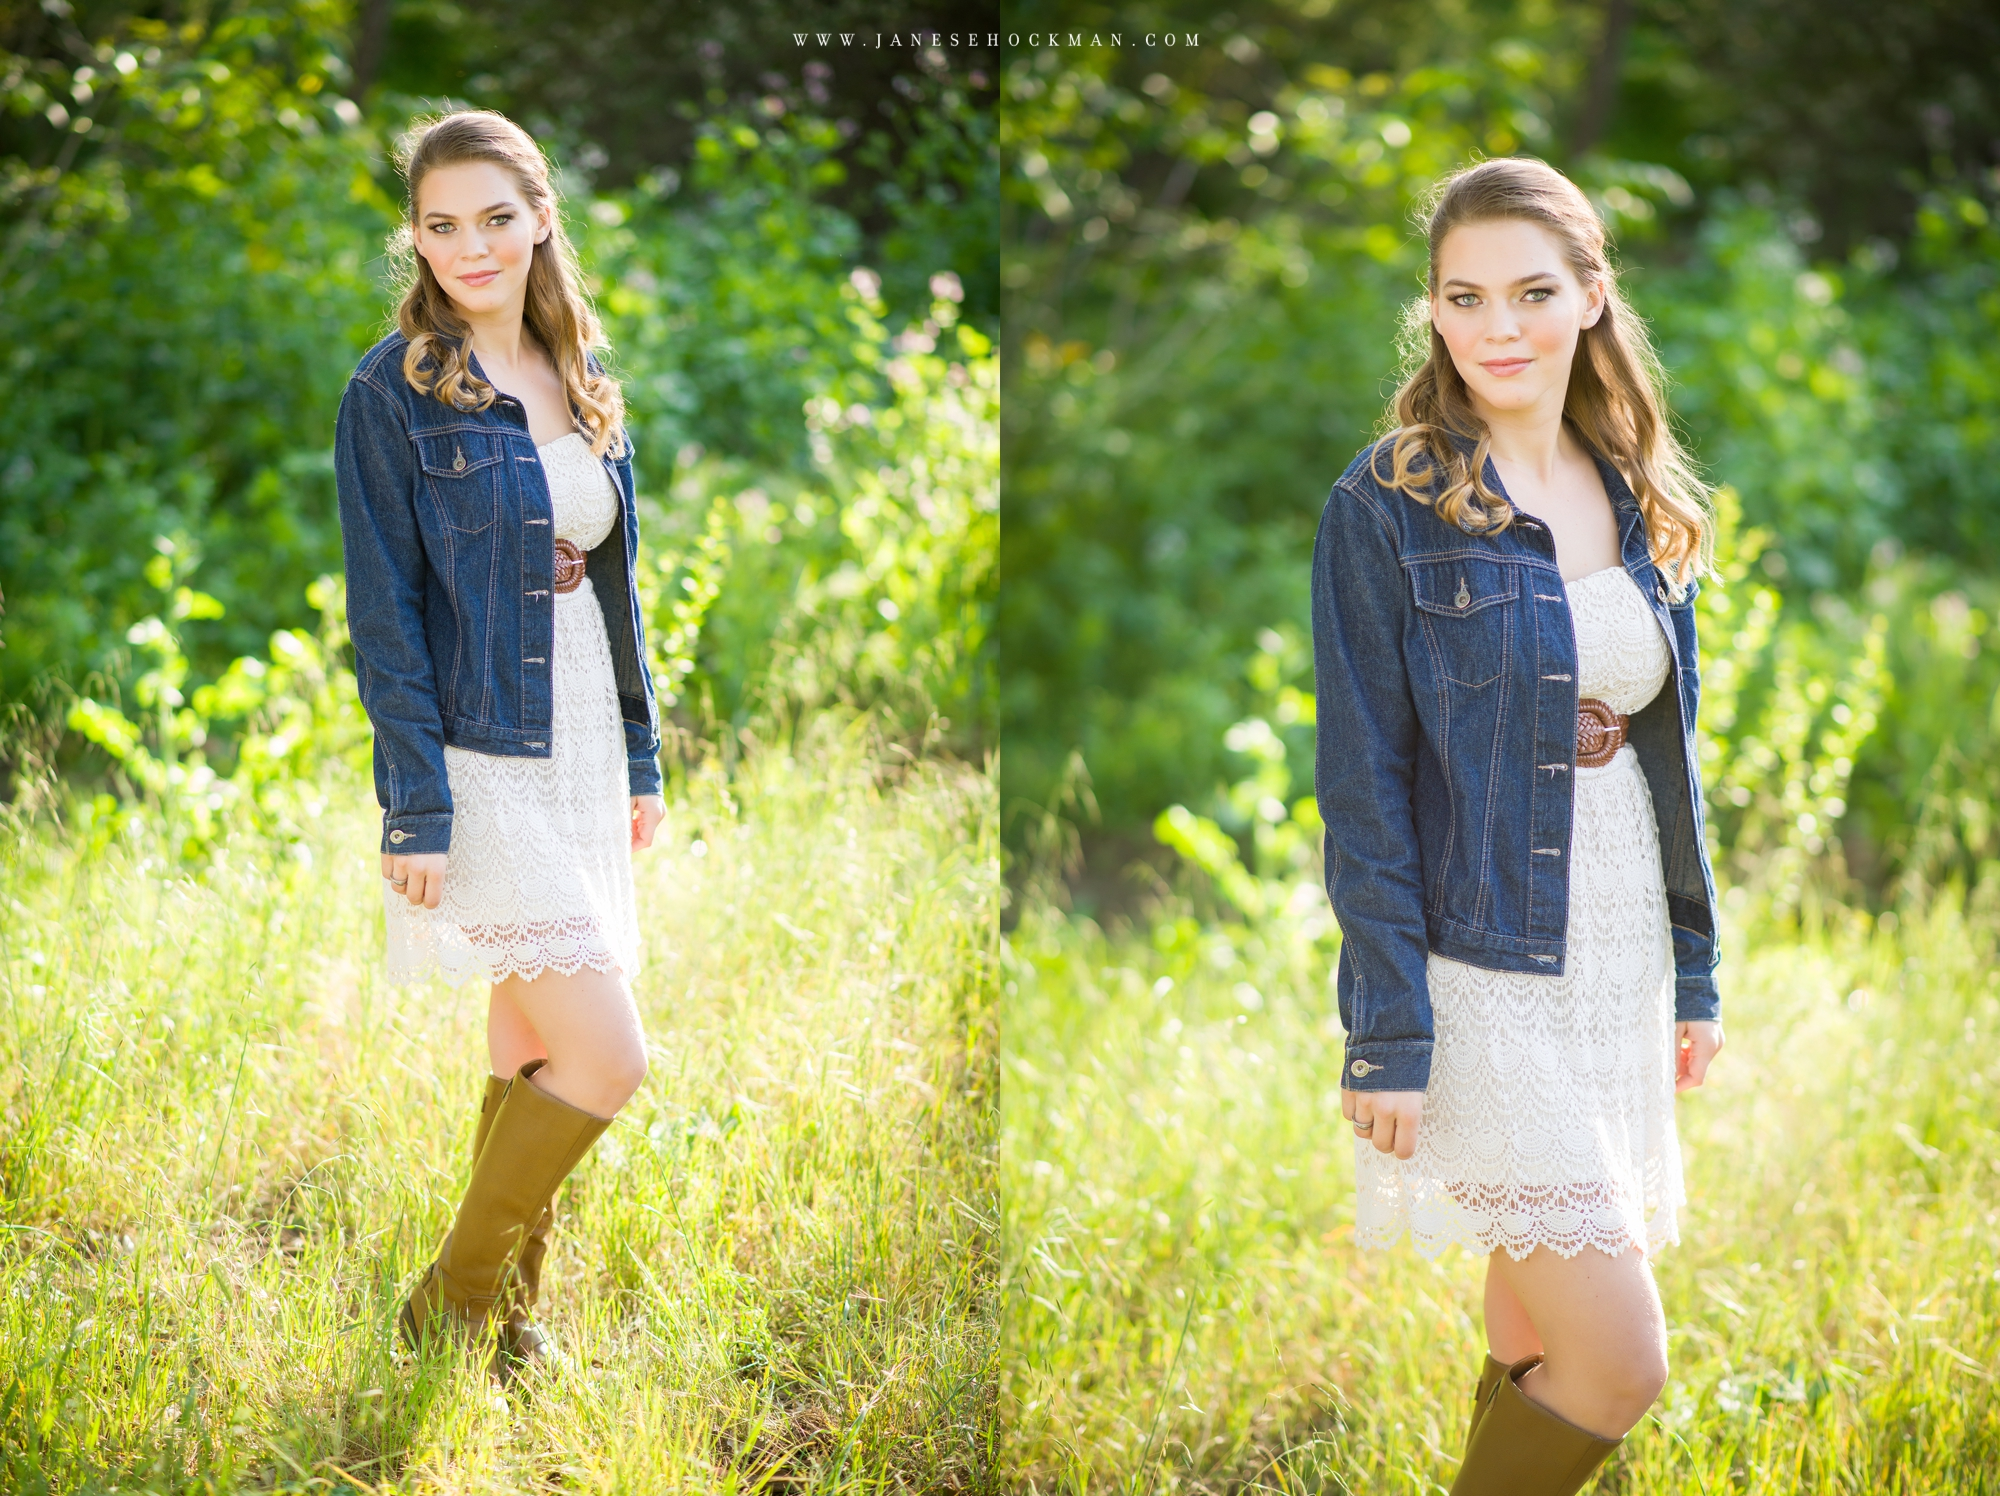 Holly   Janese Hockman Photography   San Luis Obispo, California   High School Senior Portraits   Huntington Beach 6.jpg